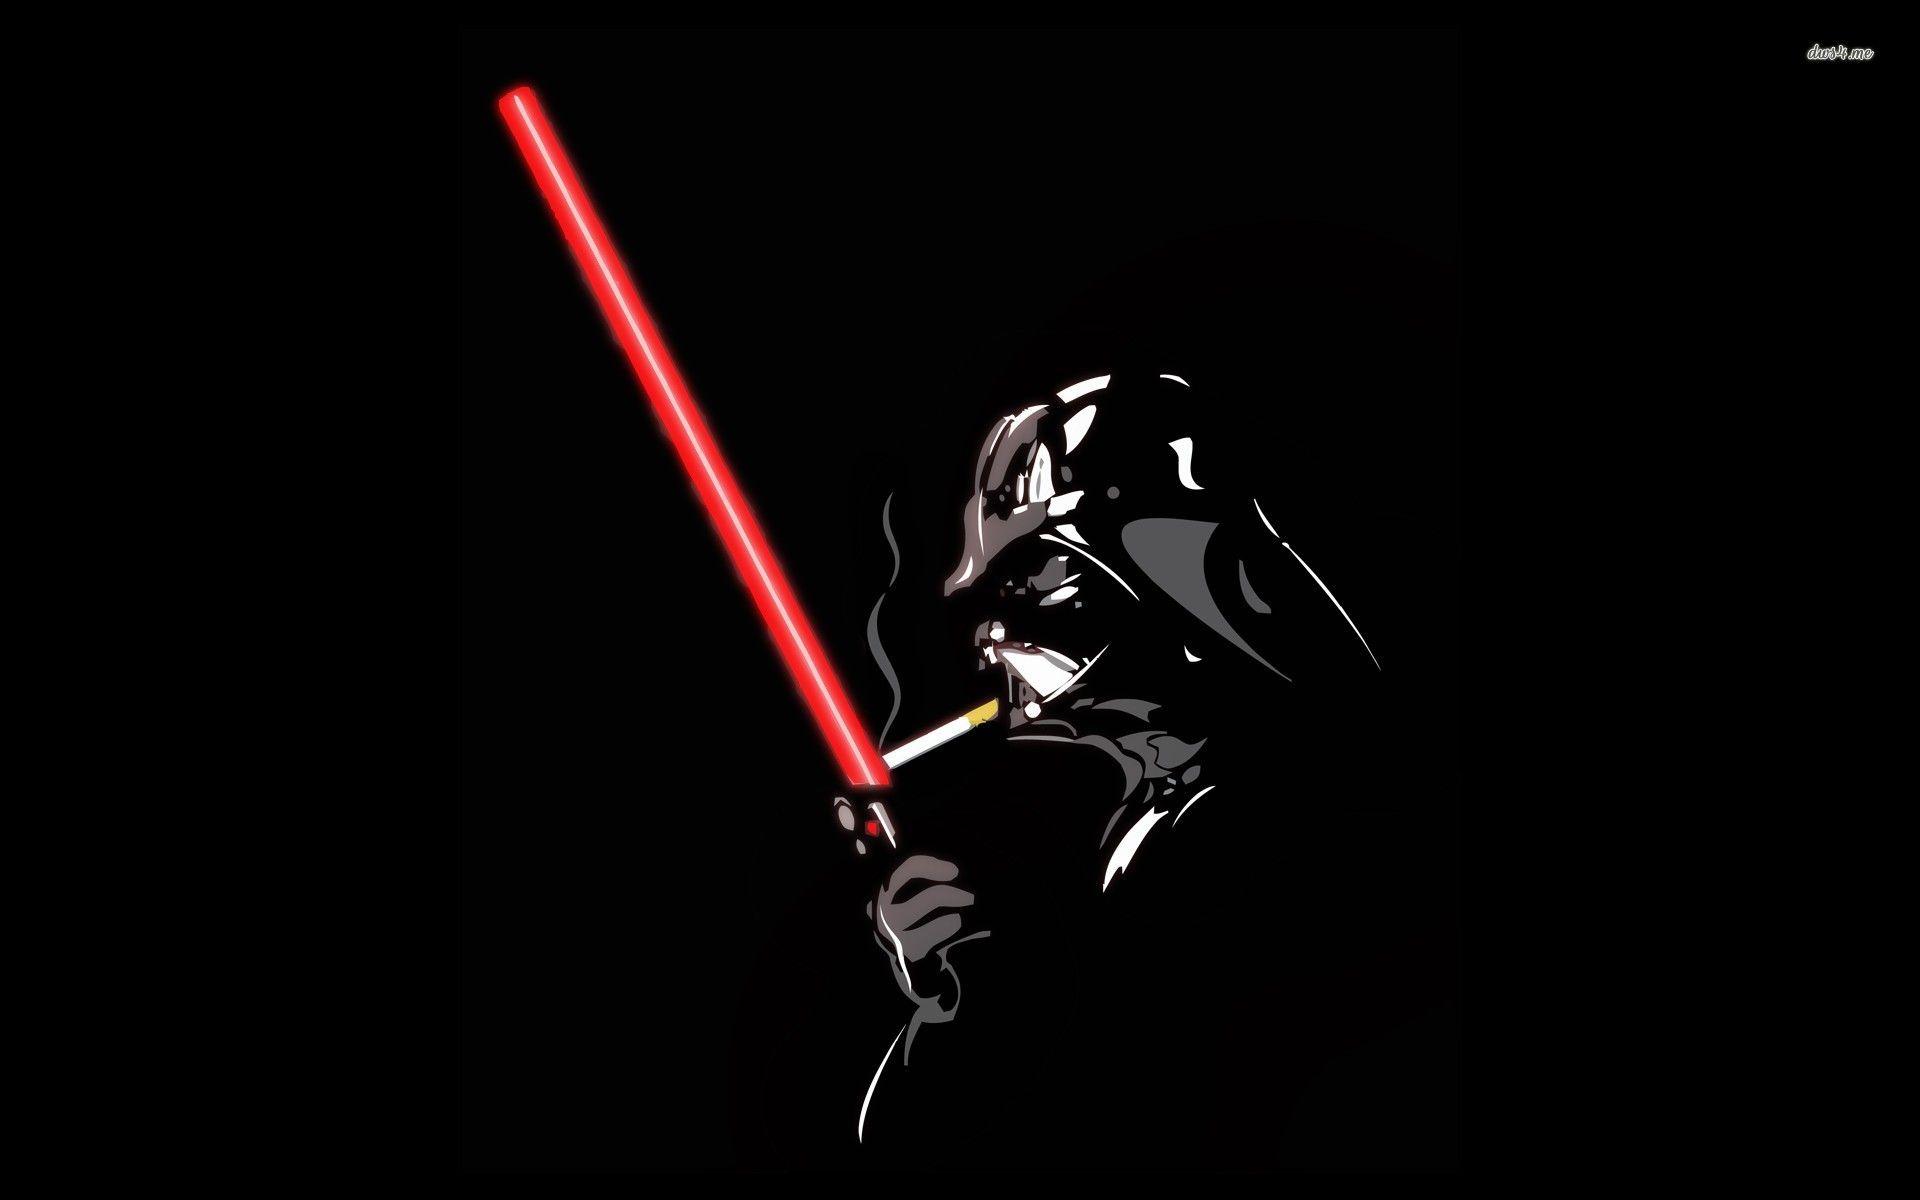 Darth Vader And His Lightsaber Hd Wallpaper Darth Vader Wallpaper Star Wars Wallpaper Darth Vader